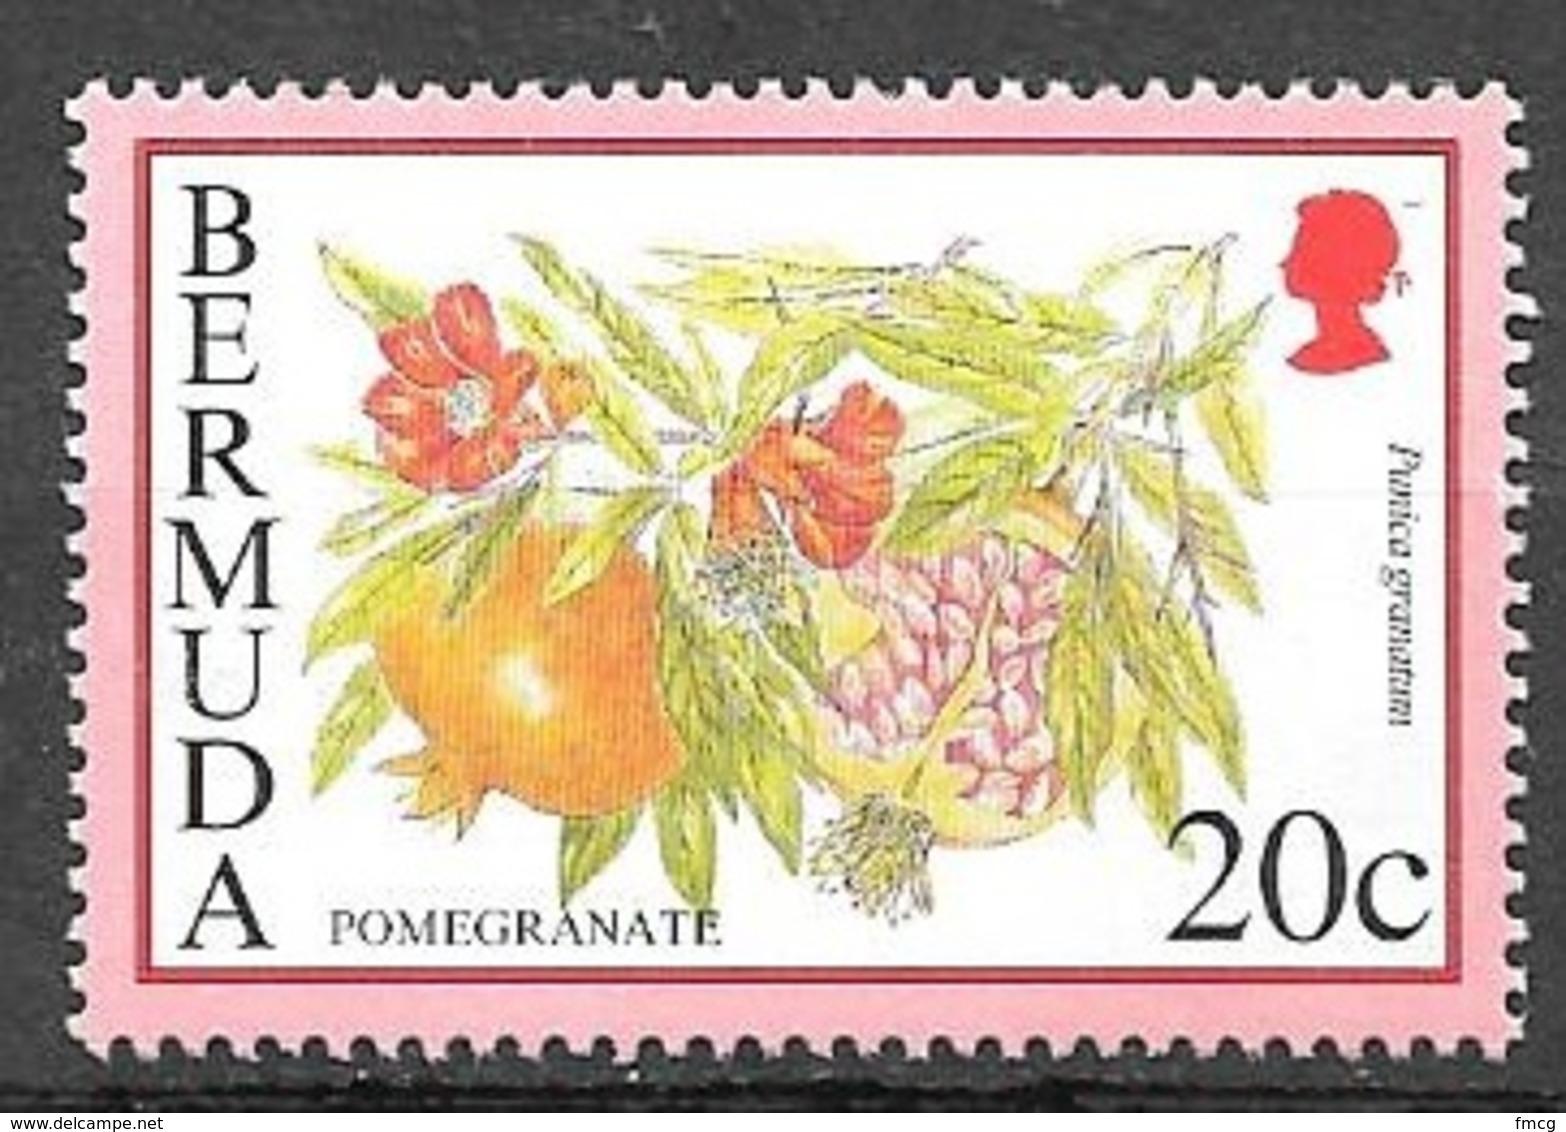 1994 20 Cents Pomegranate, Mint Never Hinged - Bermuda